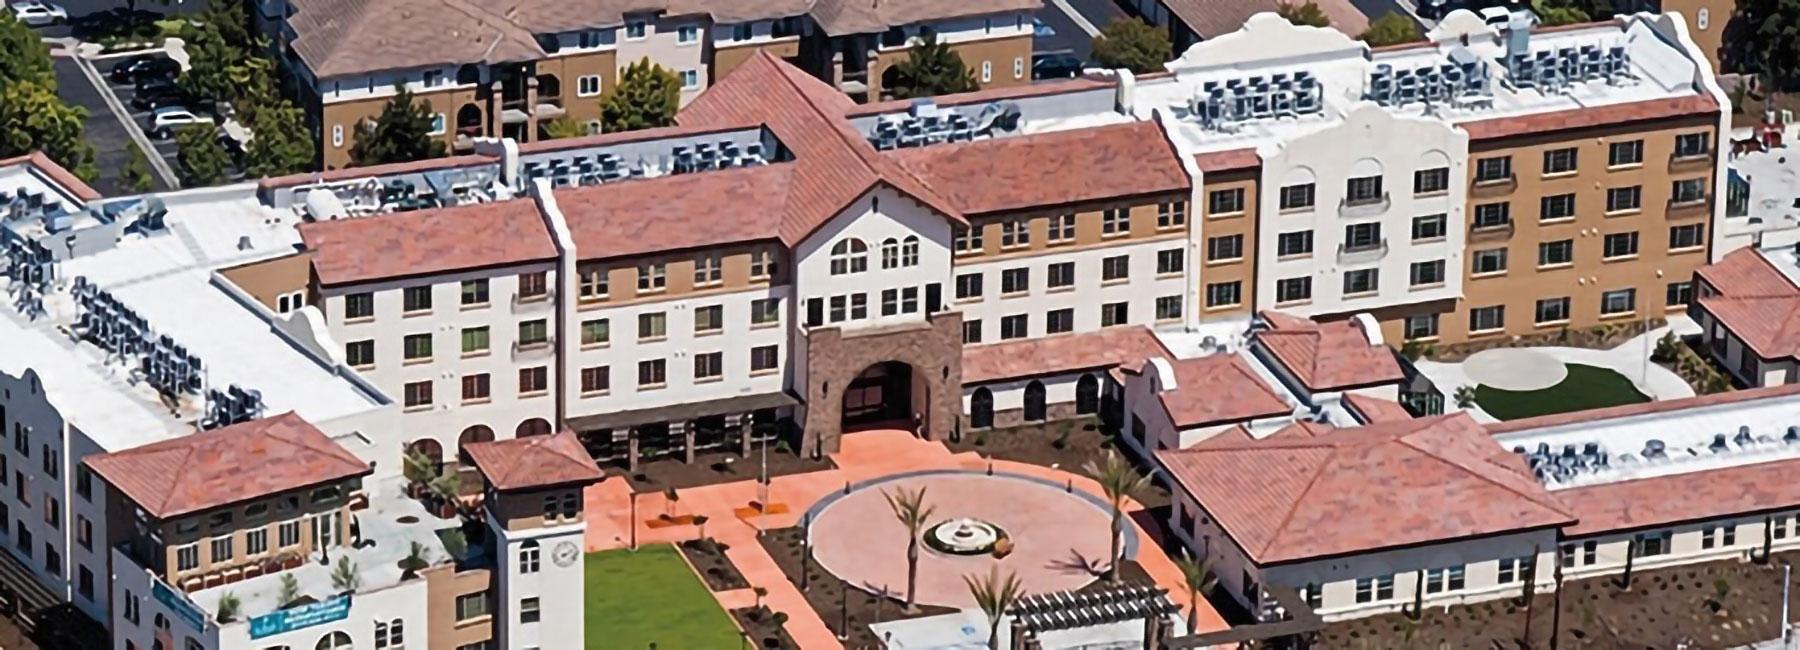 Ariel view of St Paul's Plaza Senior Housing development.